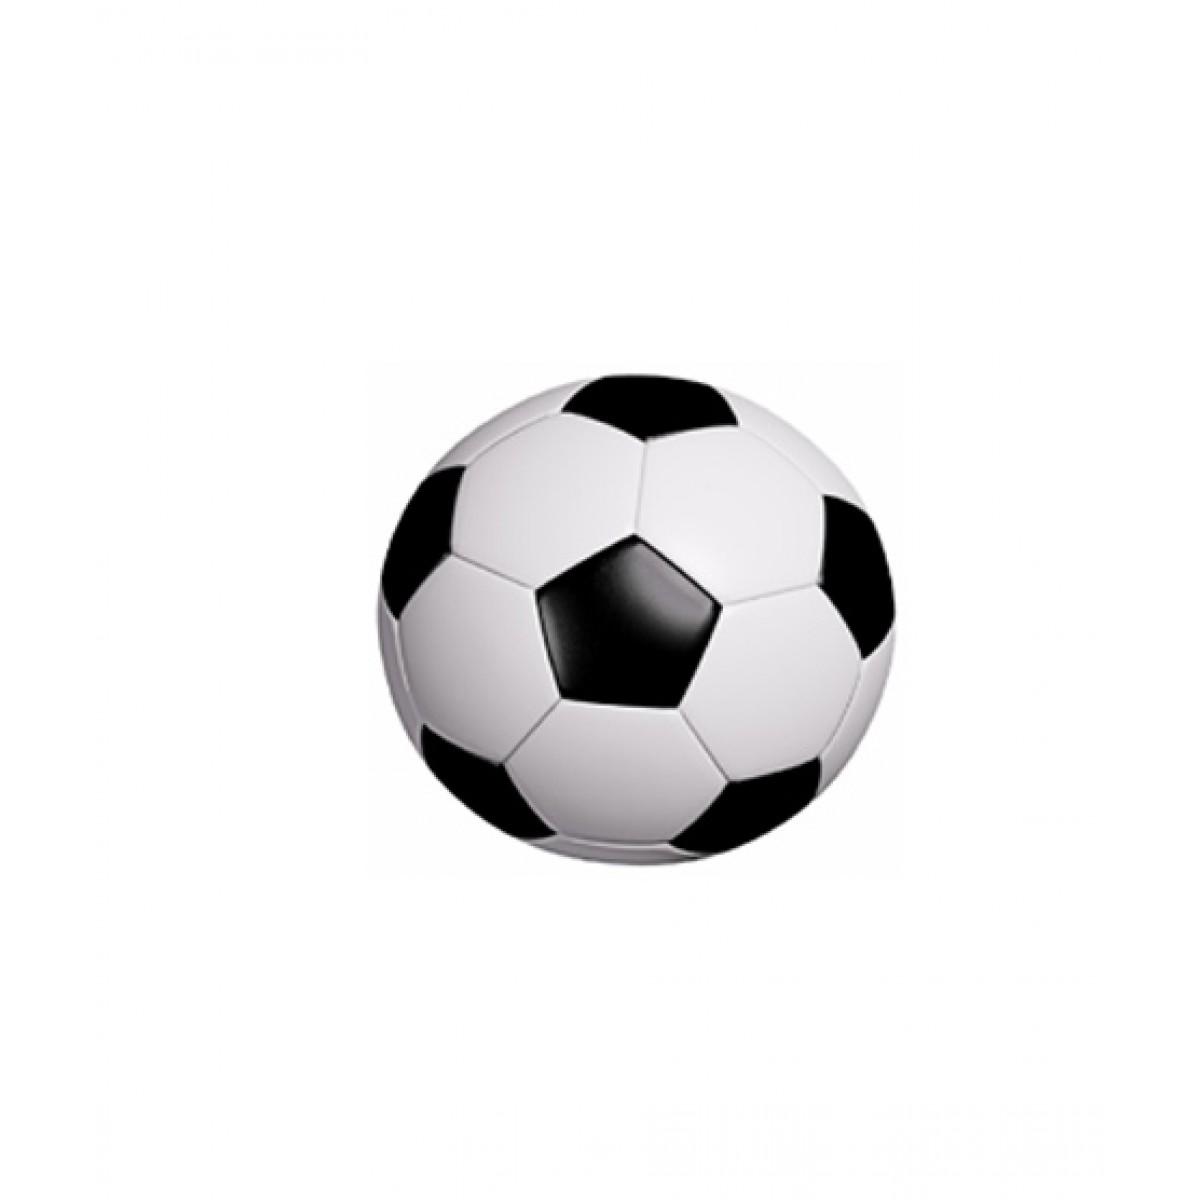 Afreeto Professional Big Leather Style Football (0081)